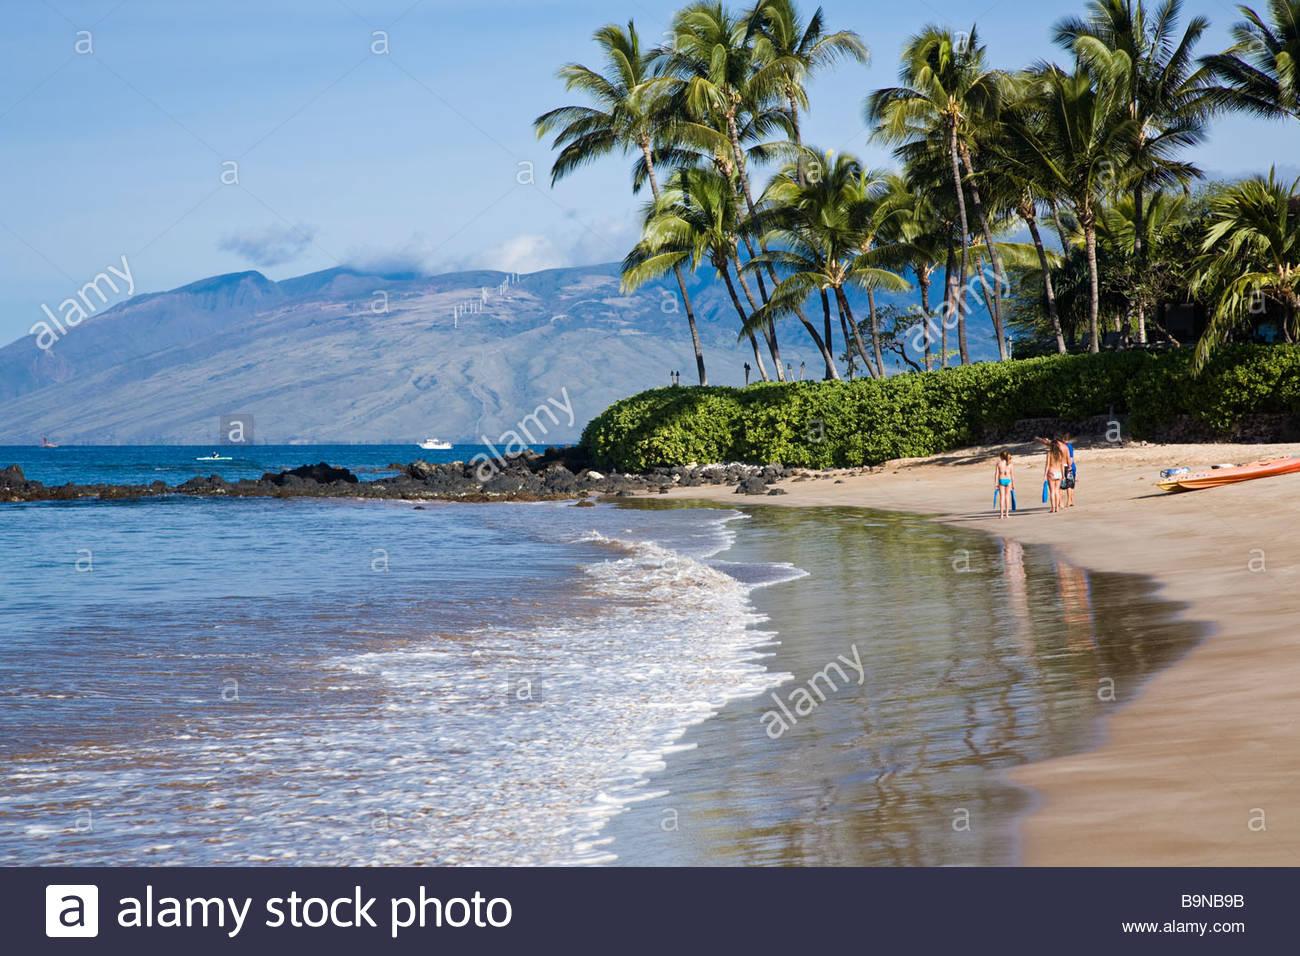 palauea-beach-with-the-west-maui-mountai